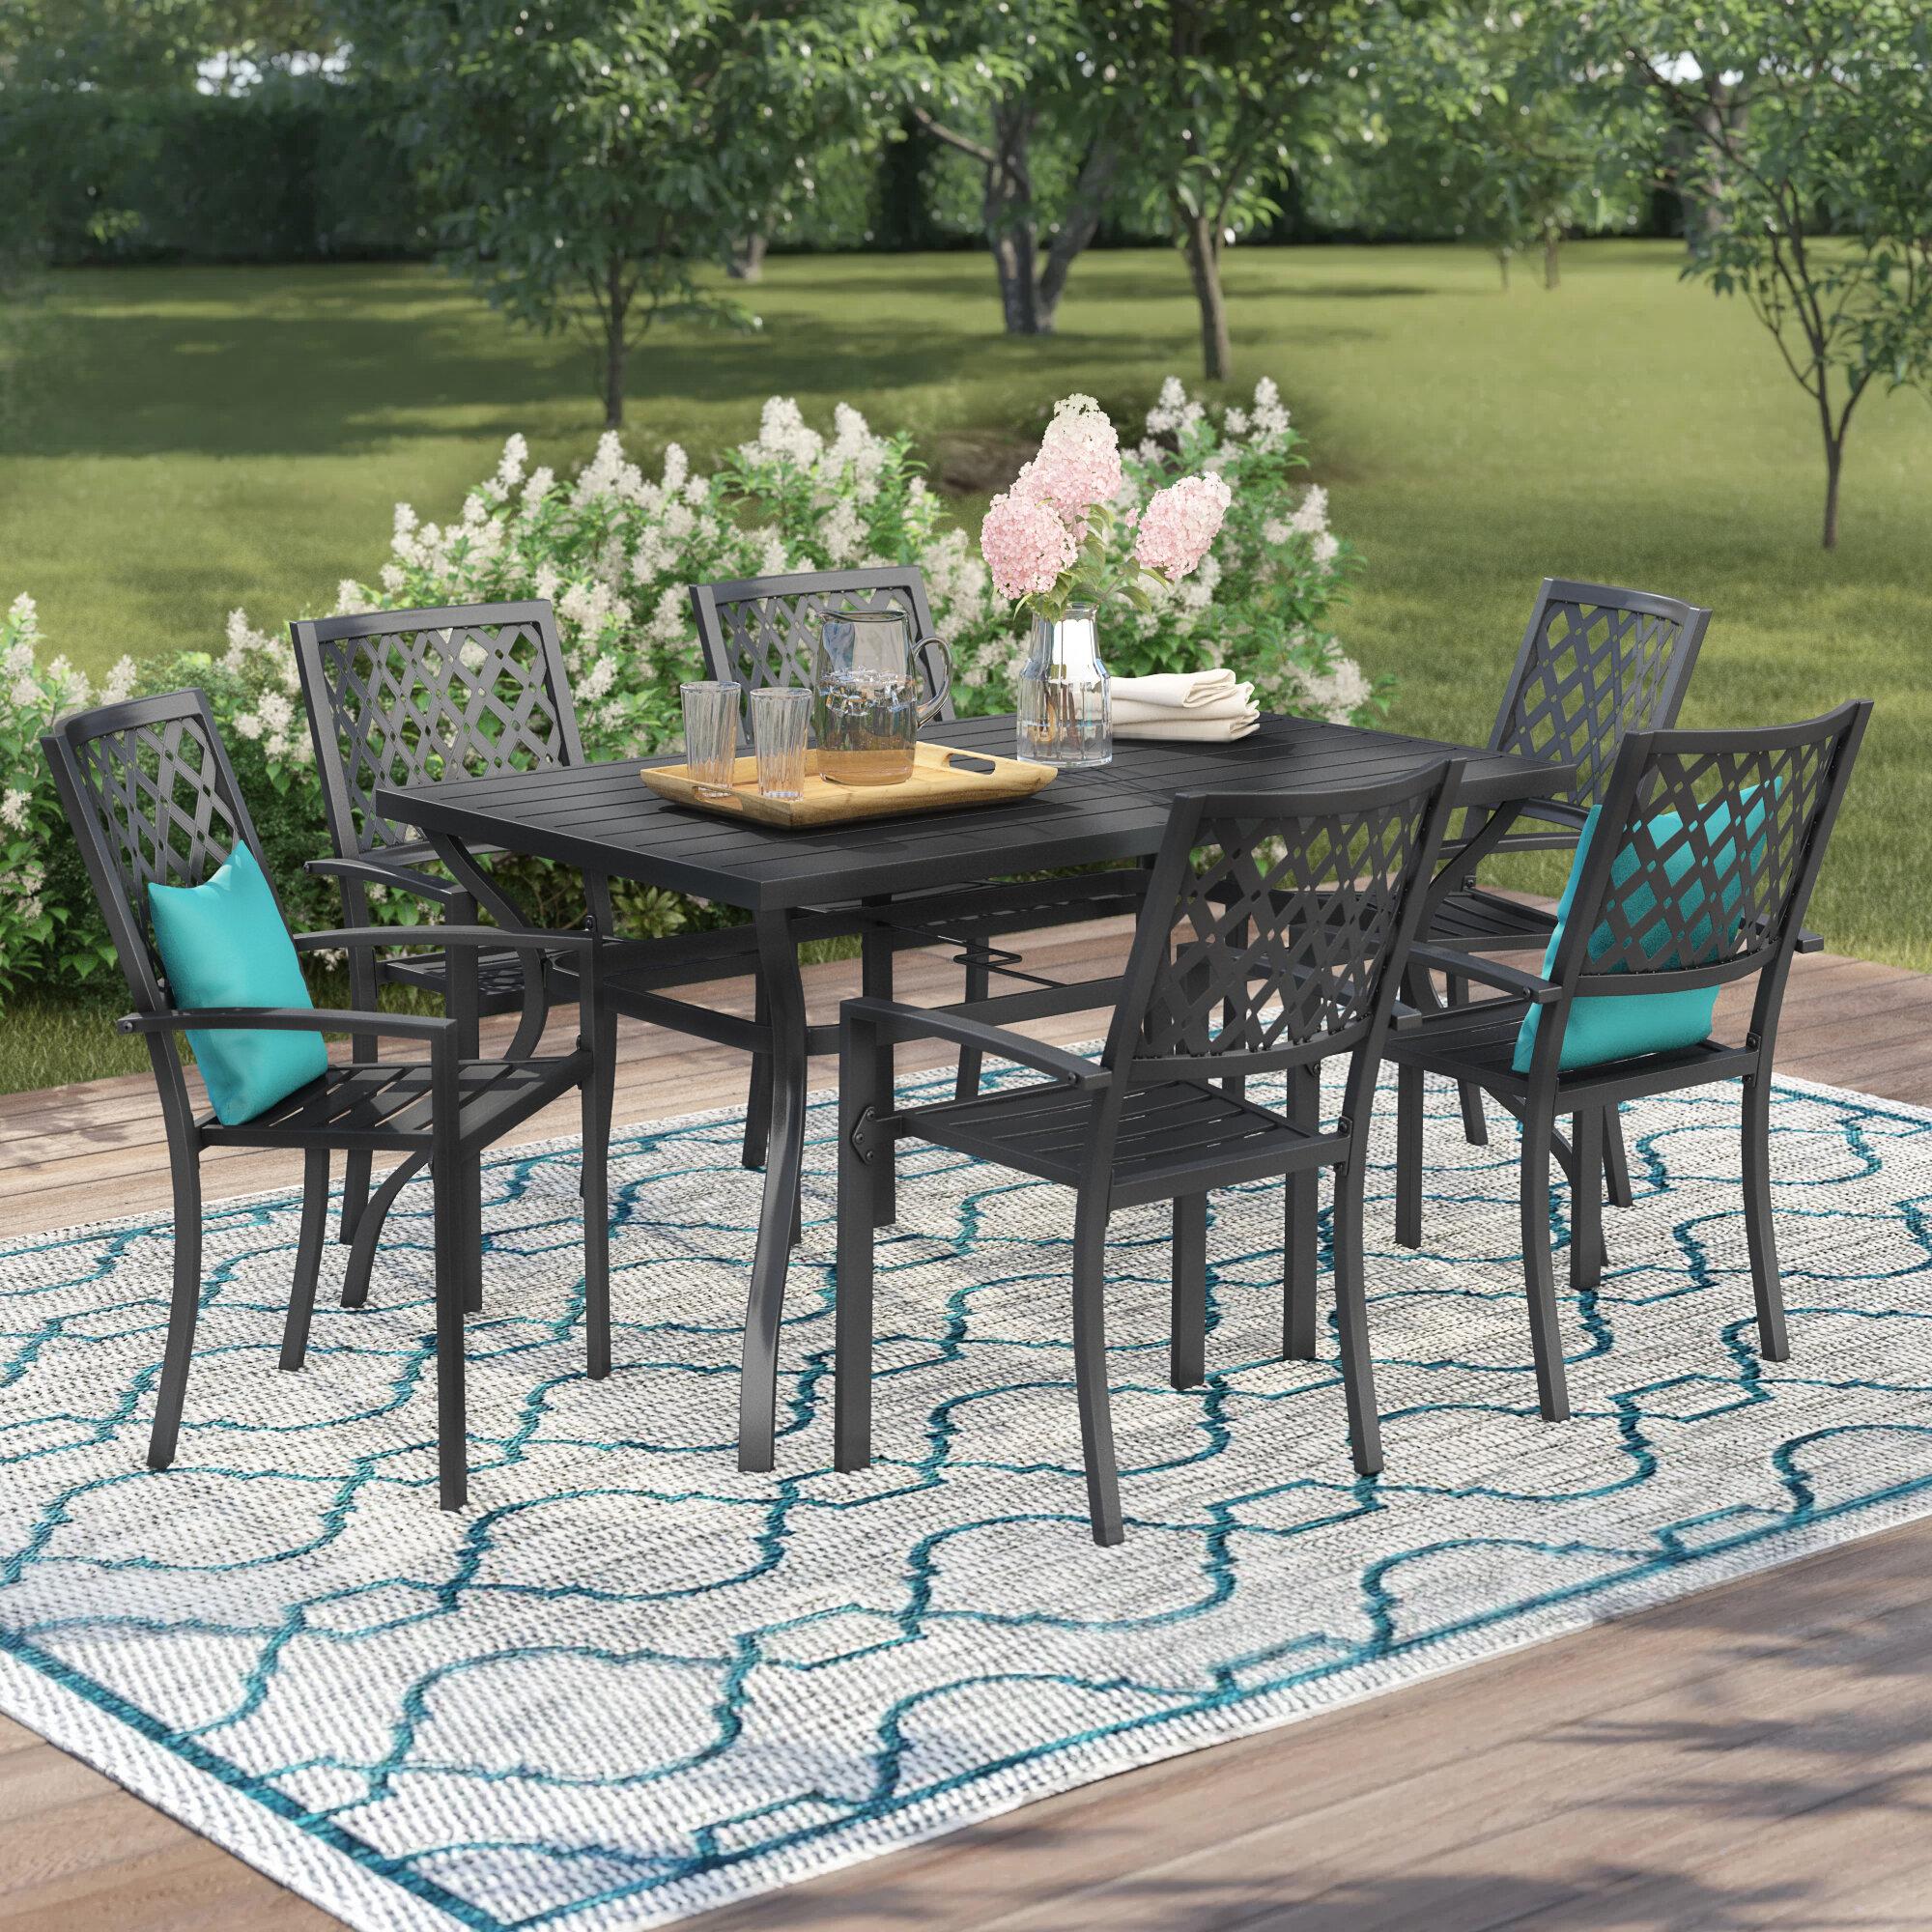 Table Runner /'Allium/' Textile Decoration Living Room Dining Patio Garden balcony